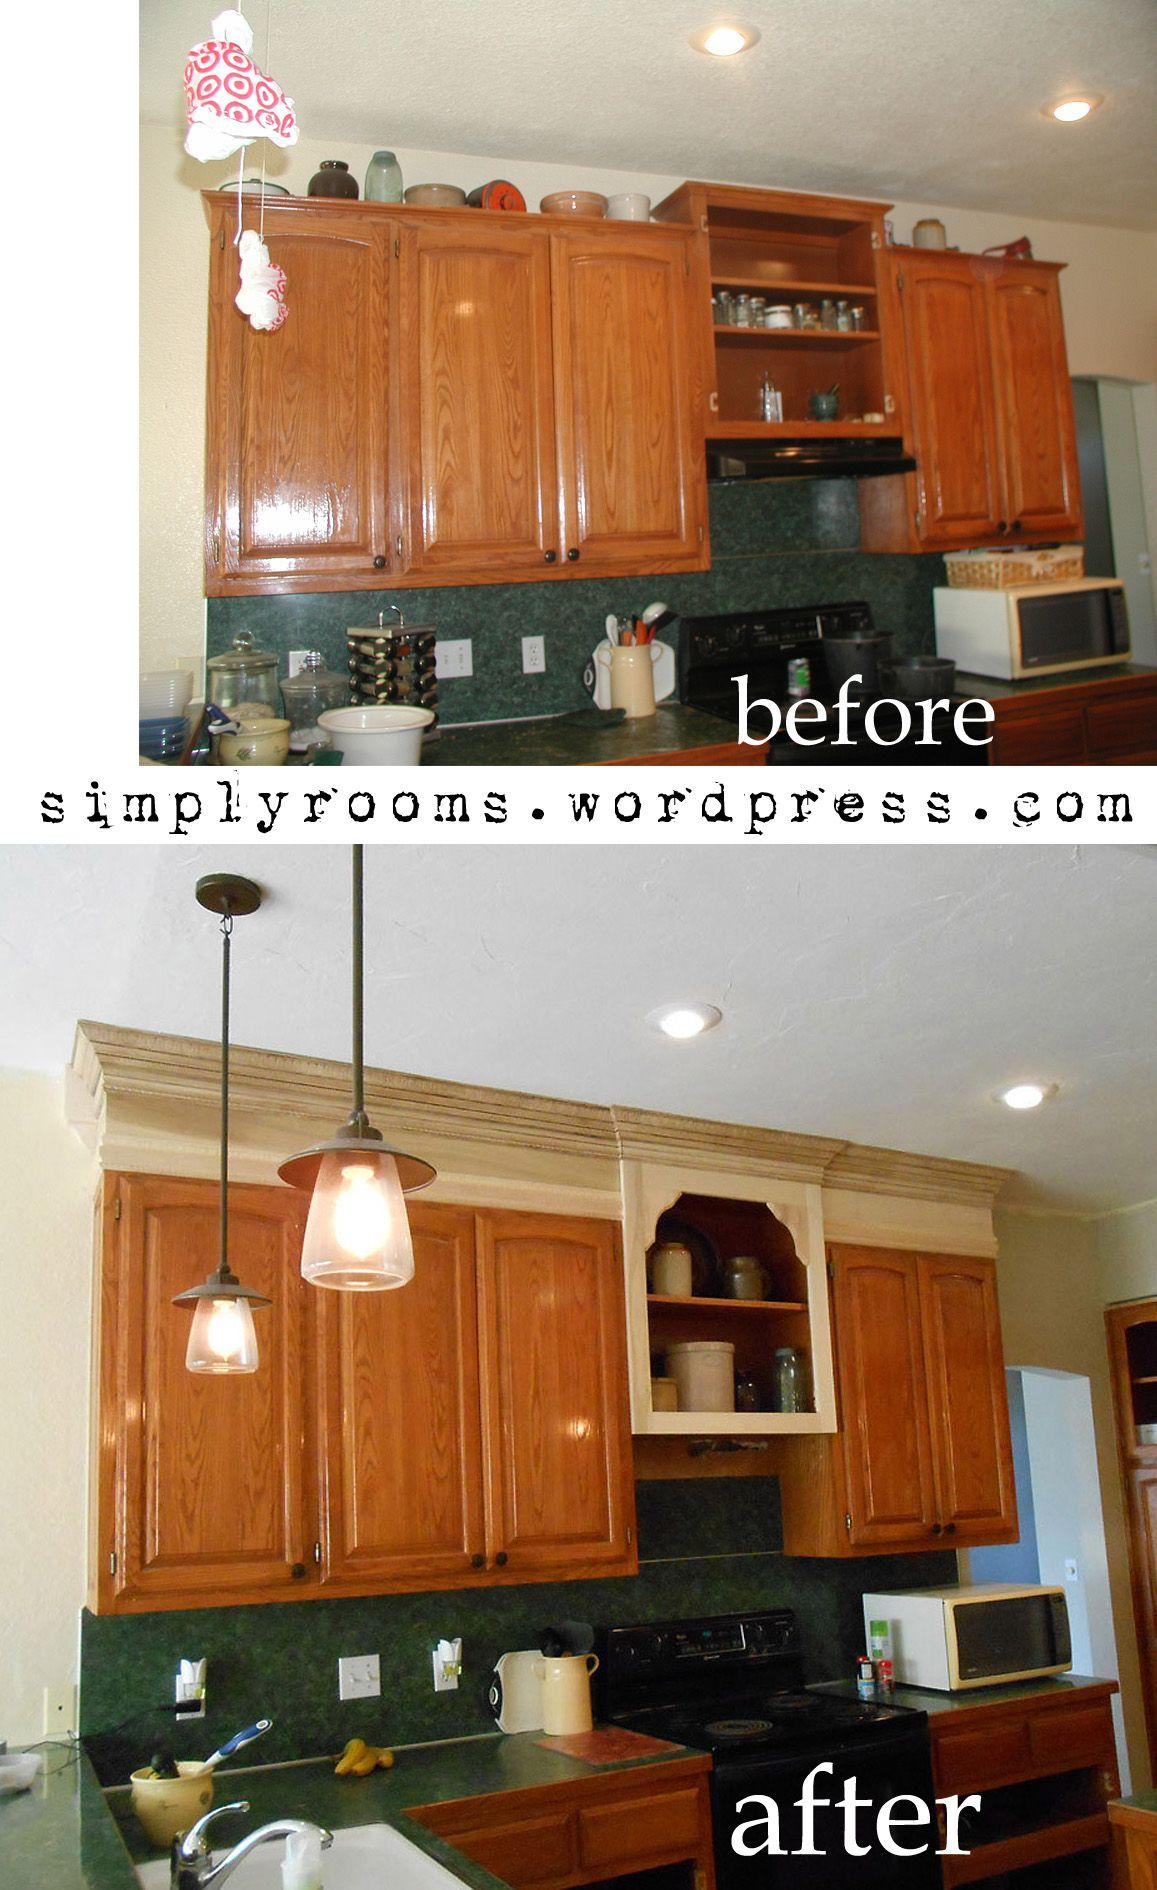 project making an upper wall cabinet taller kitchen kitchen cabinets to ceiling kitchen on kitchen cabinets to the ceiling id=30874